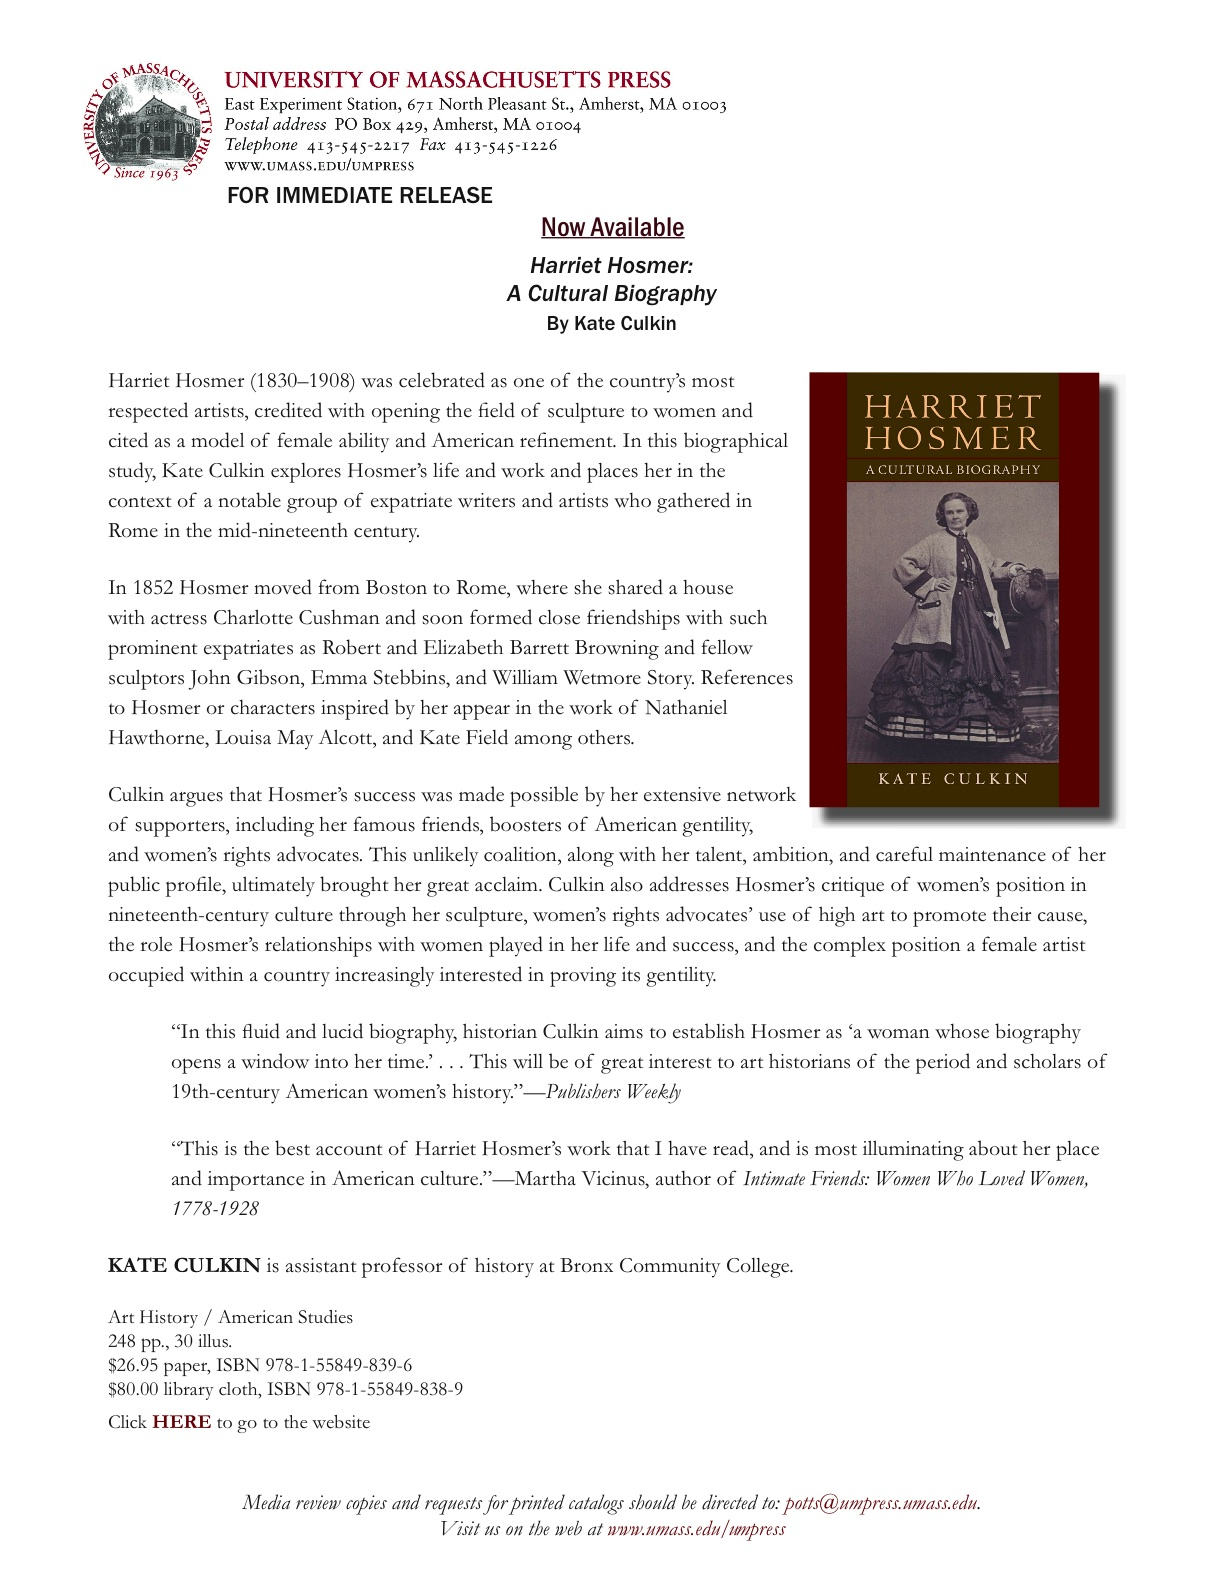 harriet hosmer a cultural biography example